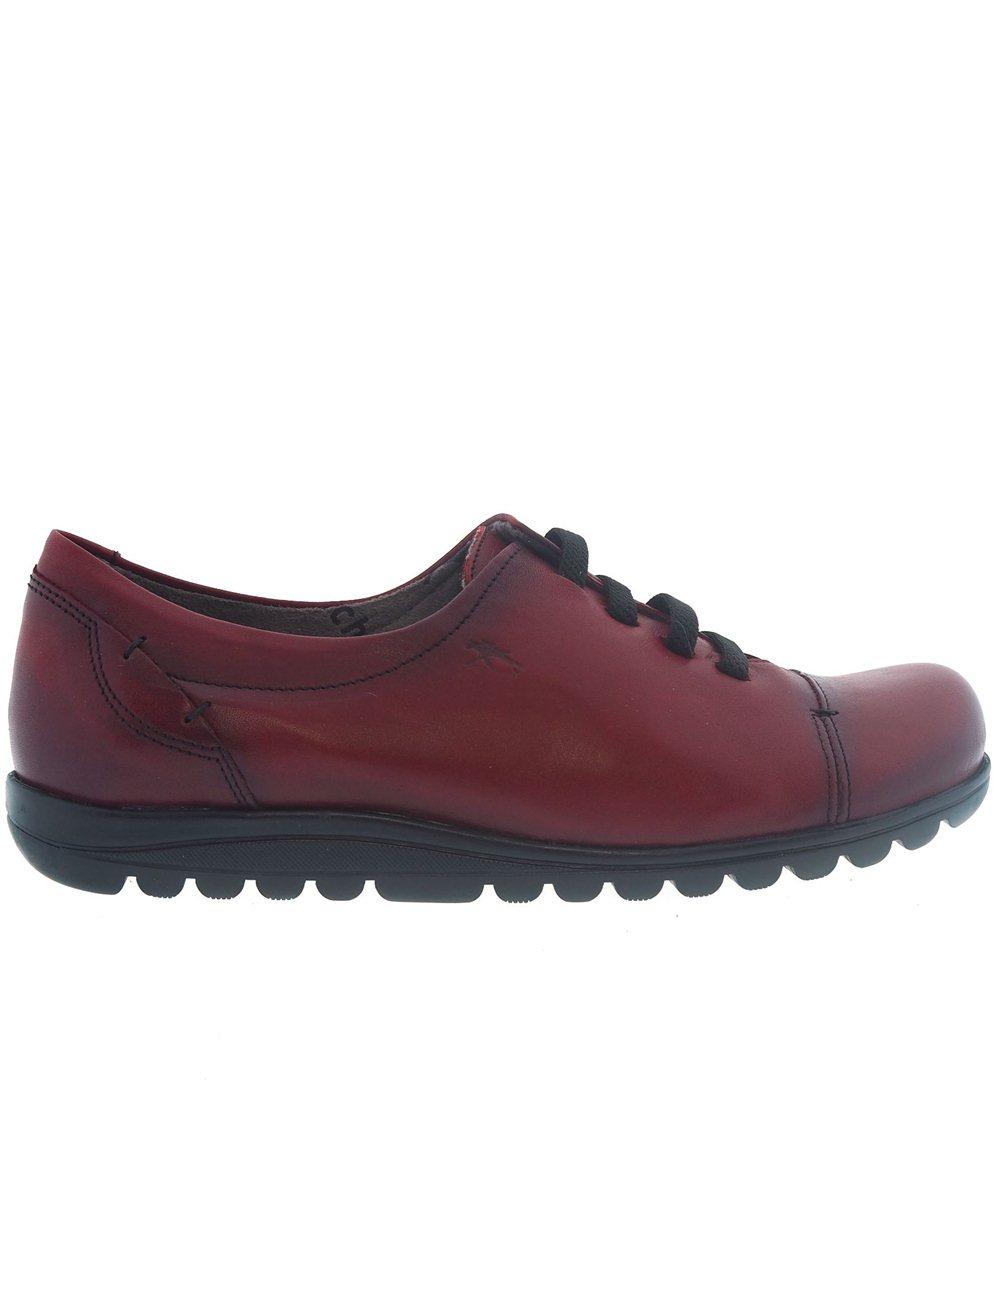 Zapatos Fluchos 8876 Picota